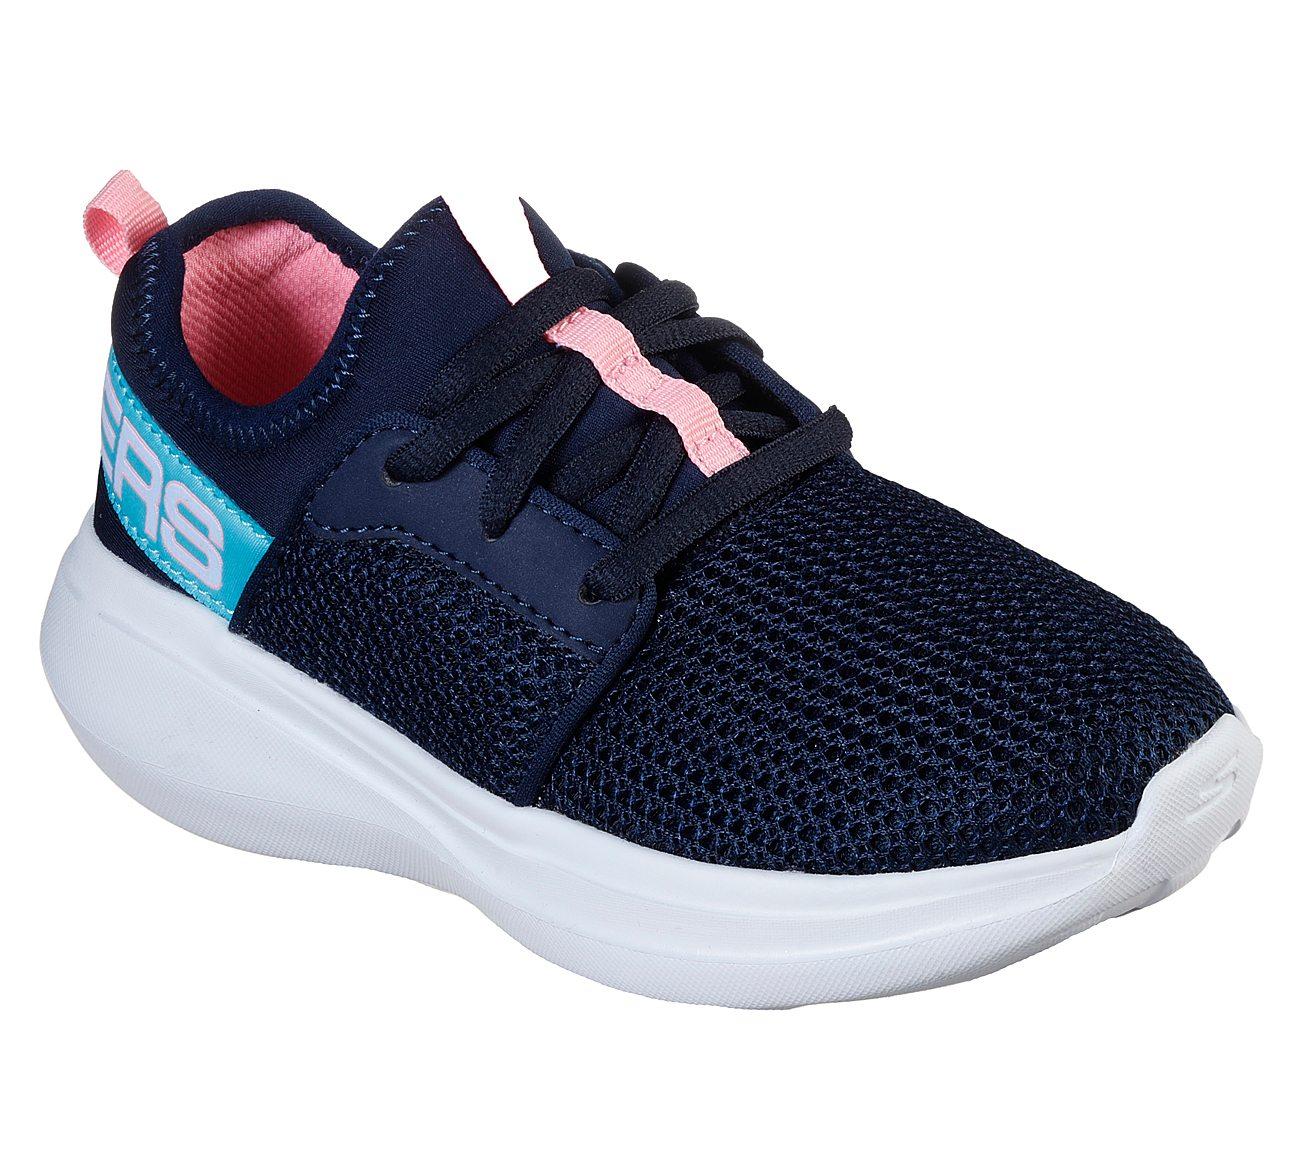 d68d33c924 Buy SKECHERS Skechers GOrun Fast - Valor Skechers Performance Shoes ...